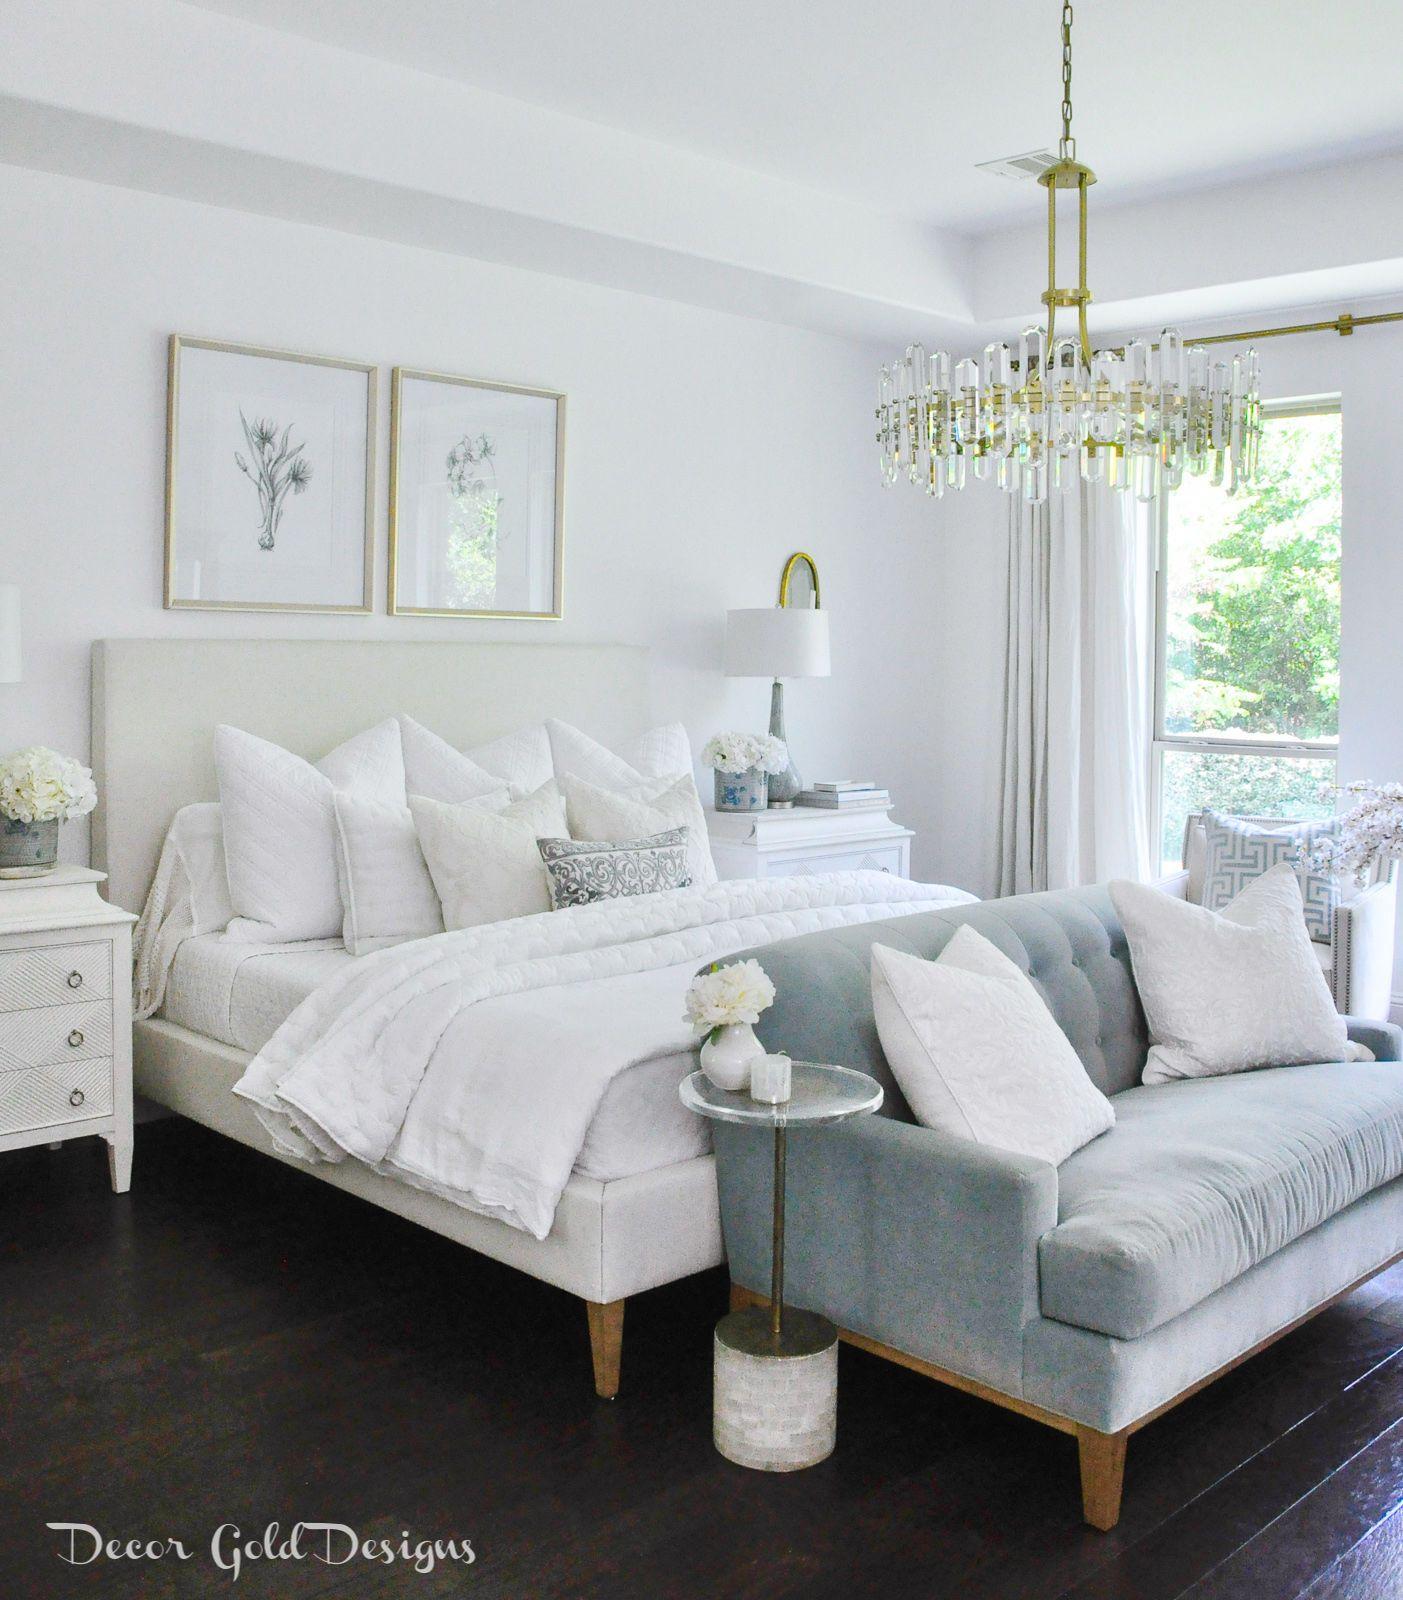 Dream Lighting A New Focal Point Decor Gold Designs Bedroom Interior Home Decor Master Bedrooms Decor